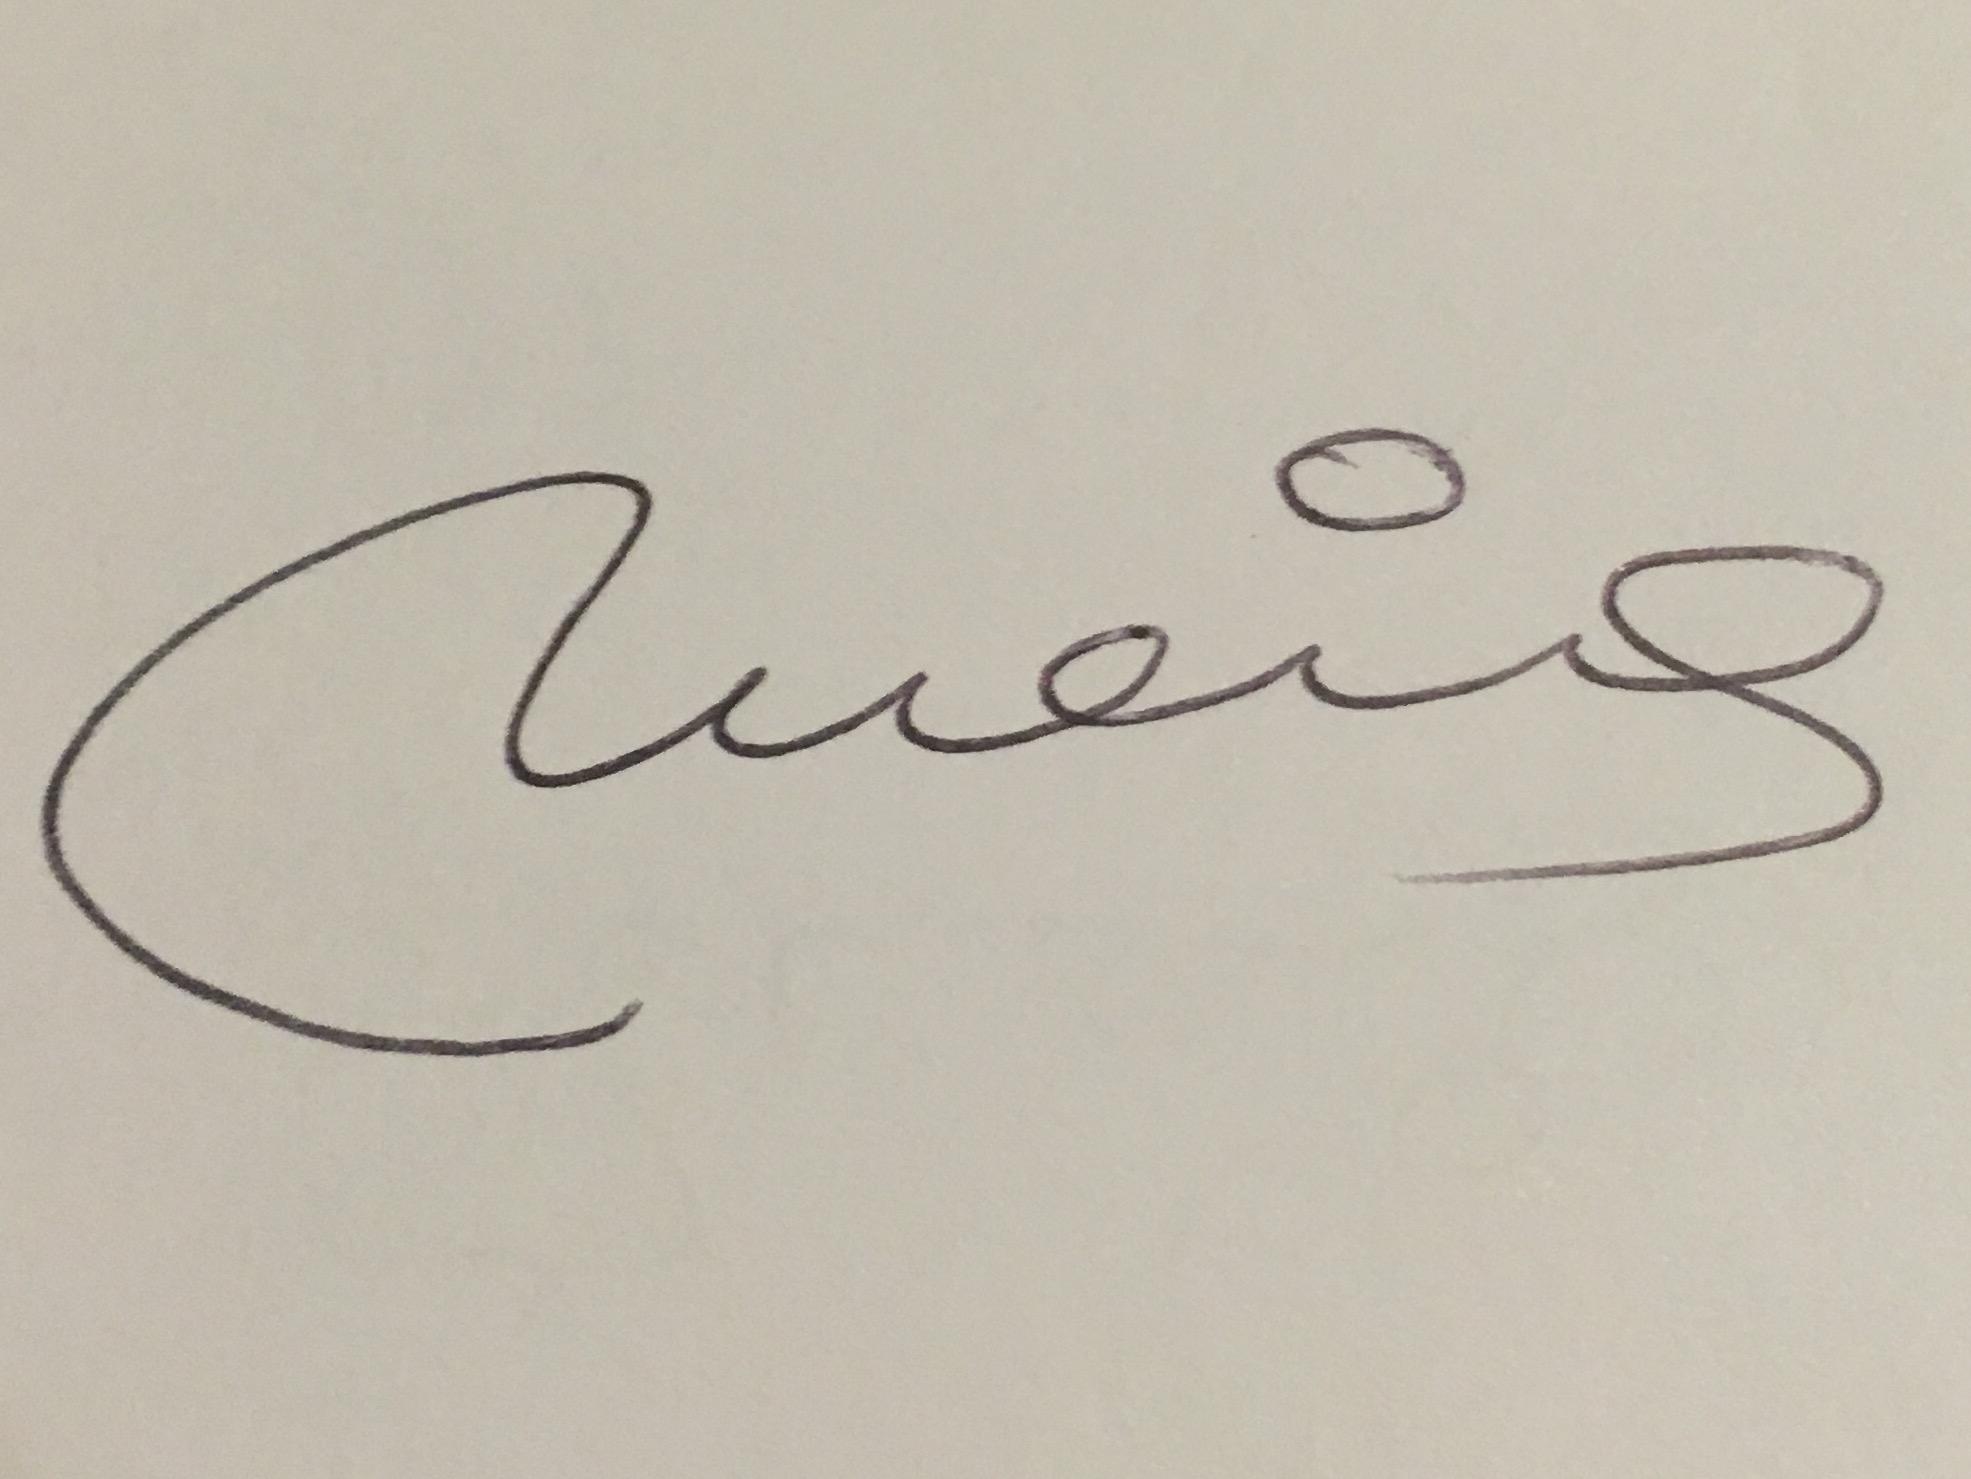 meia Prieto's Signature